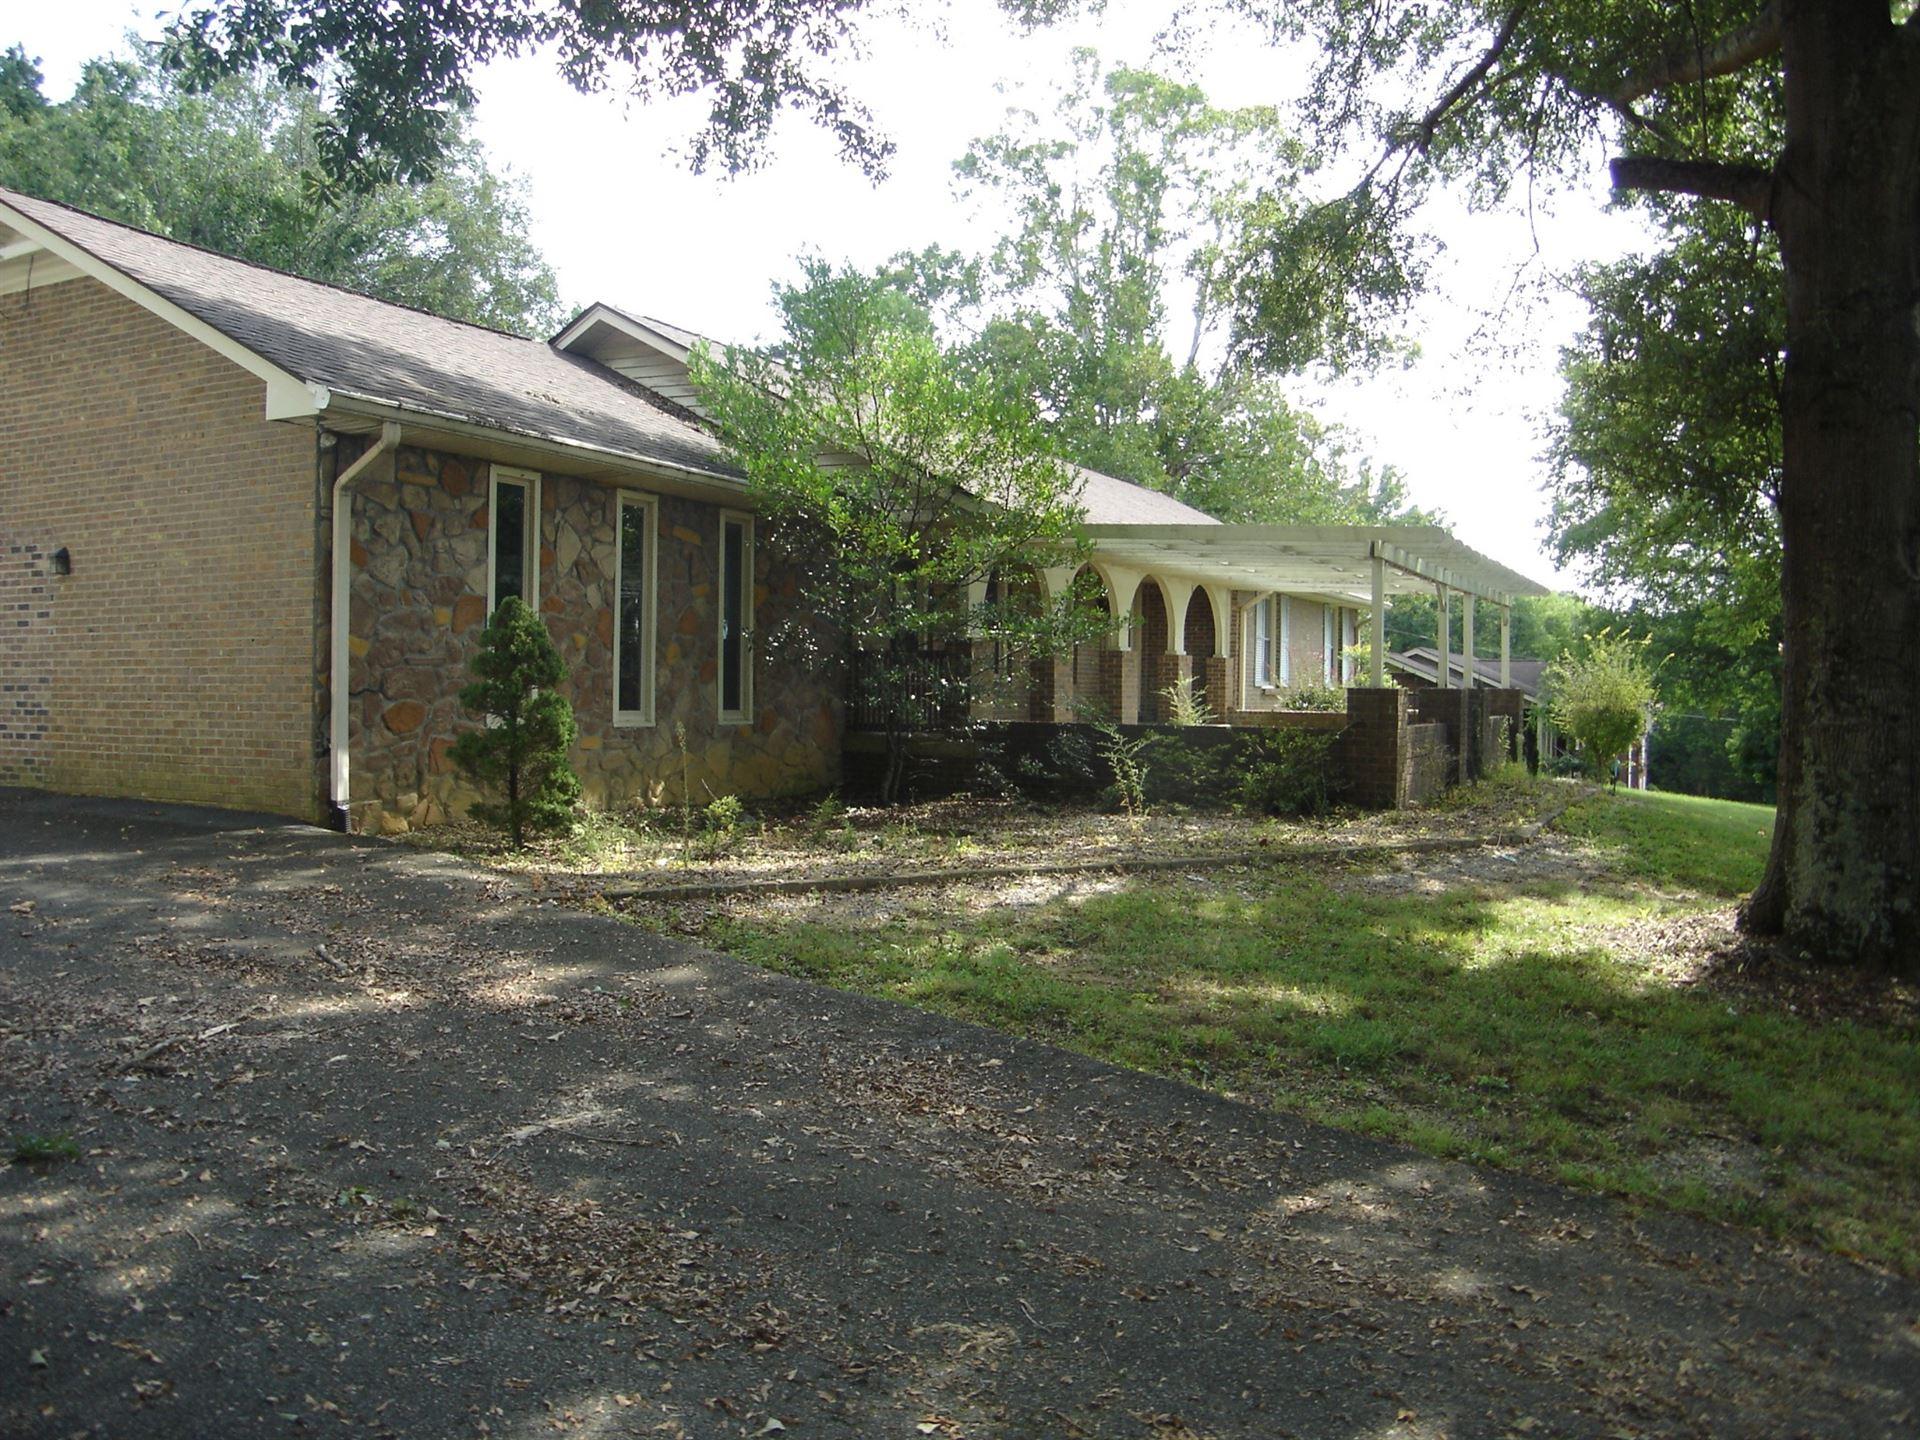 1317 Springfield Hwy, Goodlettsville, TN 37072 - MLS#: 2188538